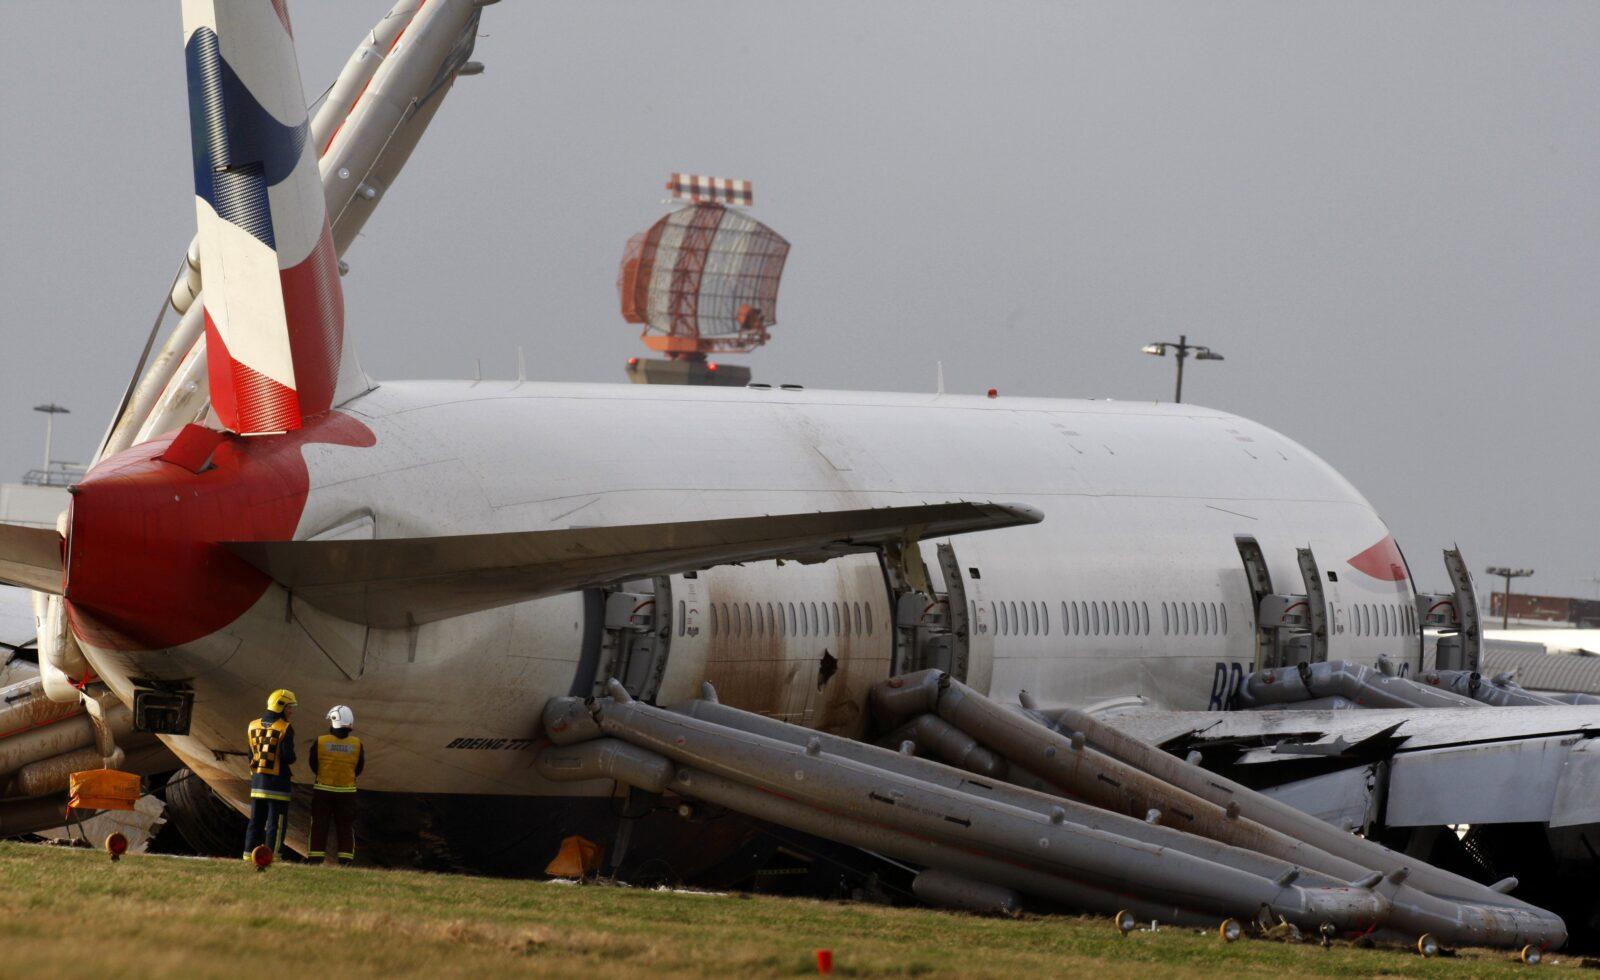 BRITISH AIRWAYS: КОШМАР НА НОВОСЕЛЬЕ